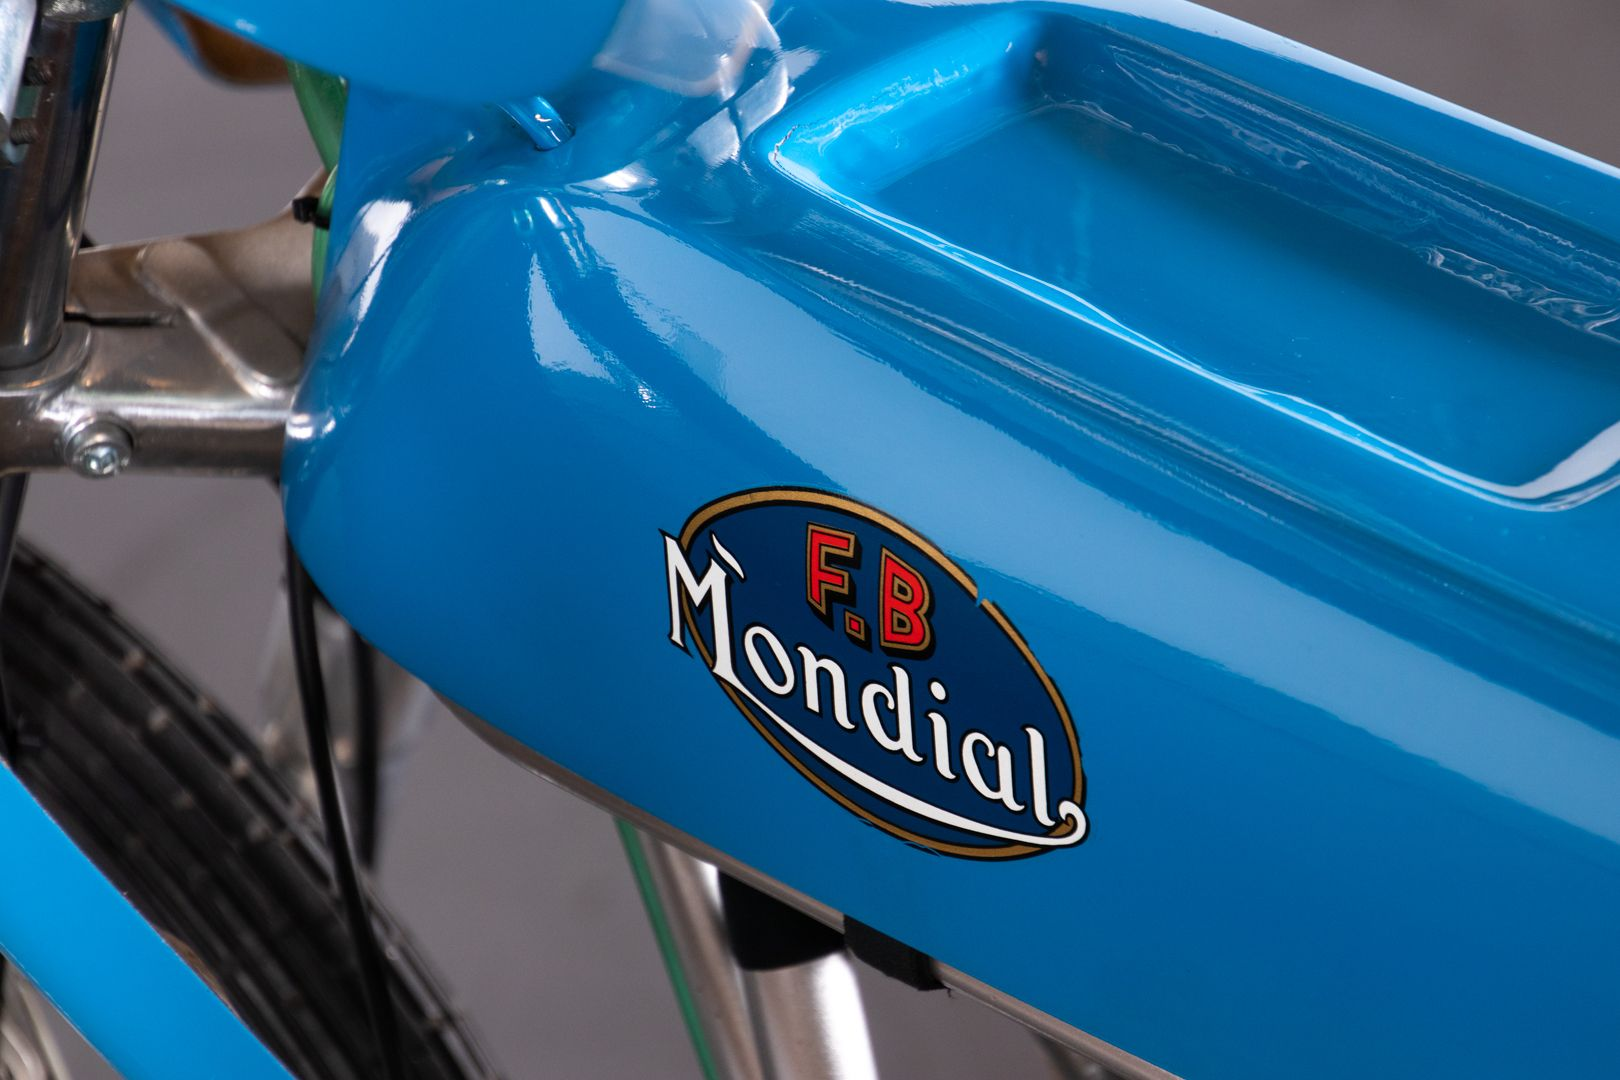 1968 MONDIAL CORSA UNICO ESEMPLARE 52054